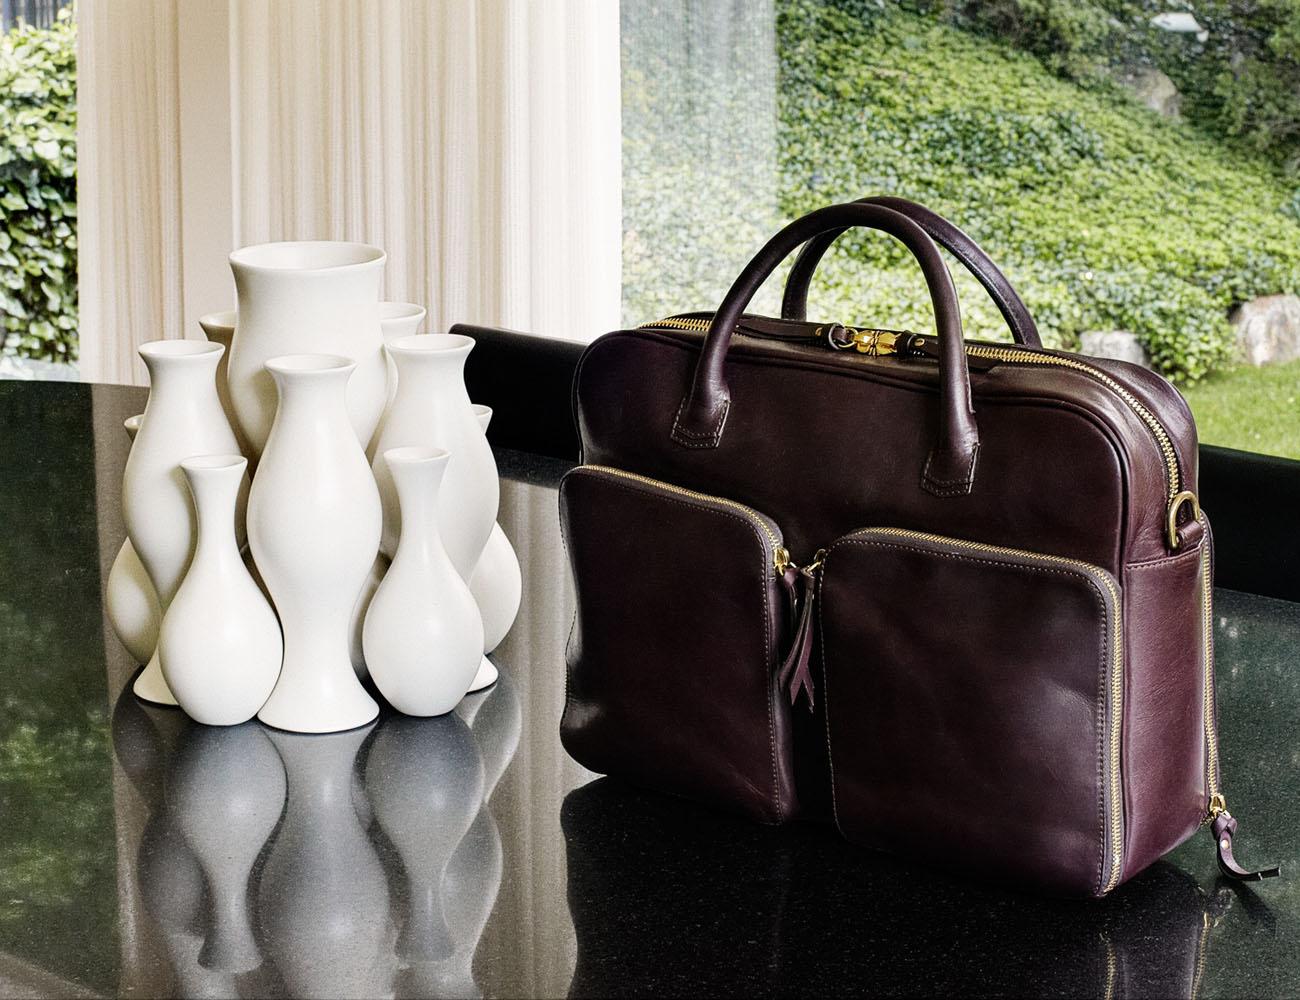 Portage Briefcase by Libero Ferrero